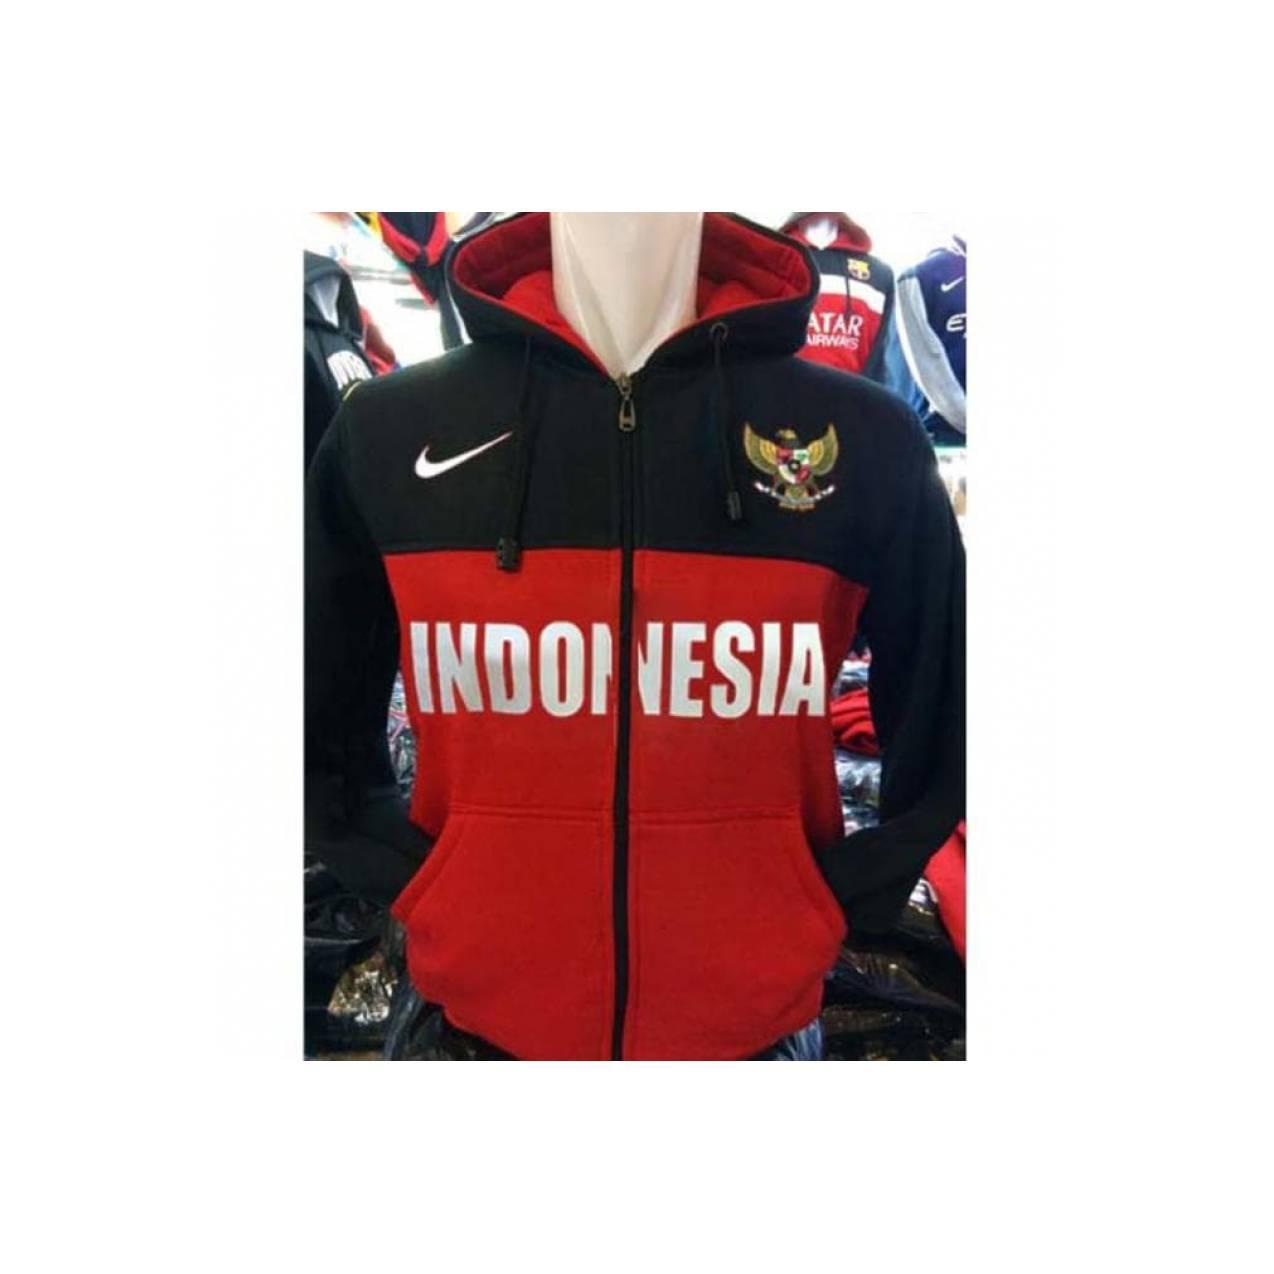 Daftar Harga Jual Timnas November 2018 Produk Laris Indonesia Jaket Hoodie Hitam Merah Id 421 Garuda Muda Home Promo